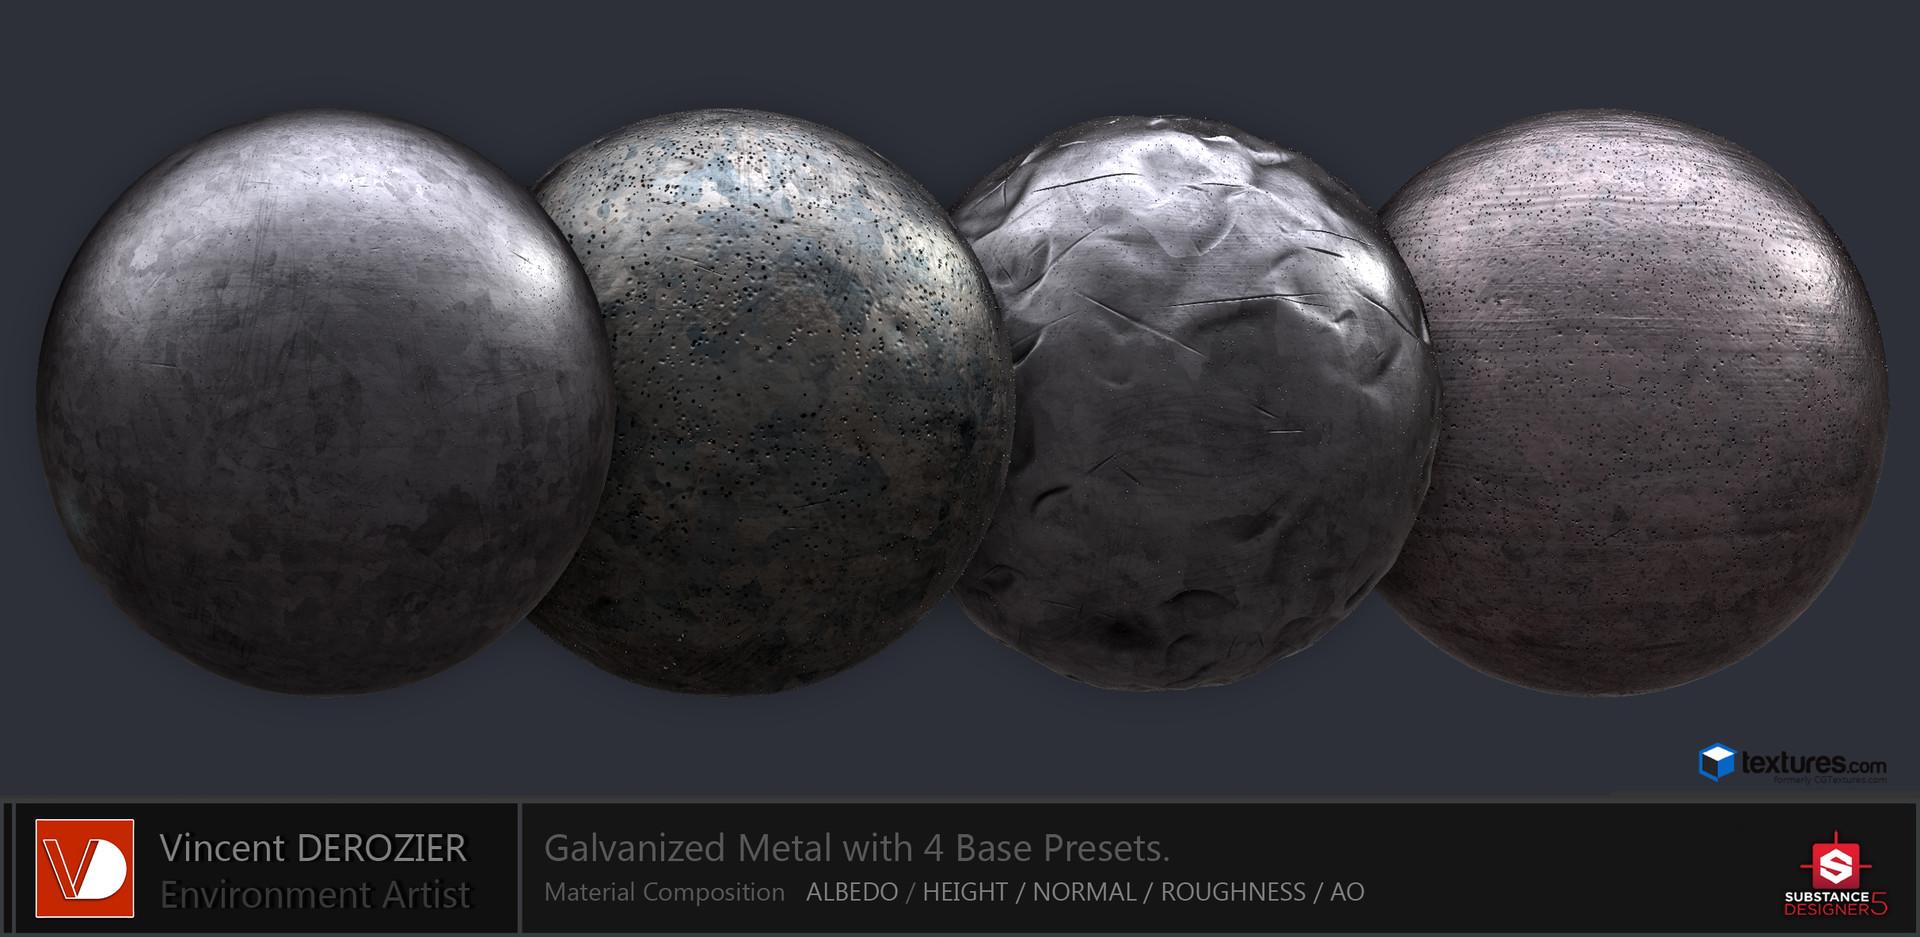 Vincent derozier galvanizedmetal00